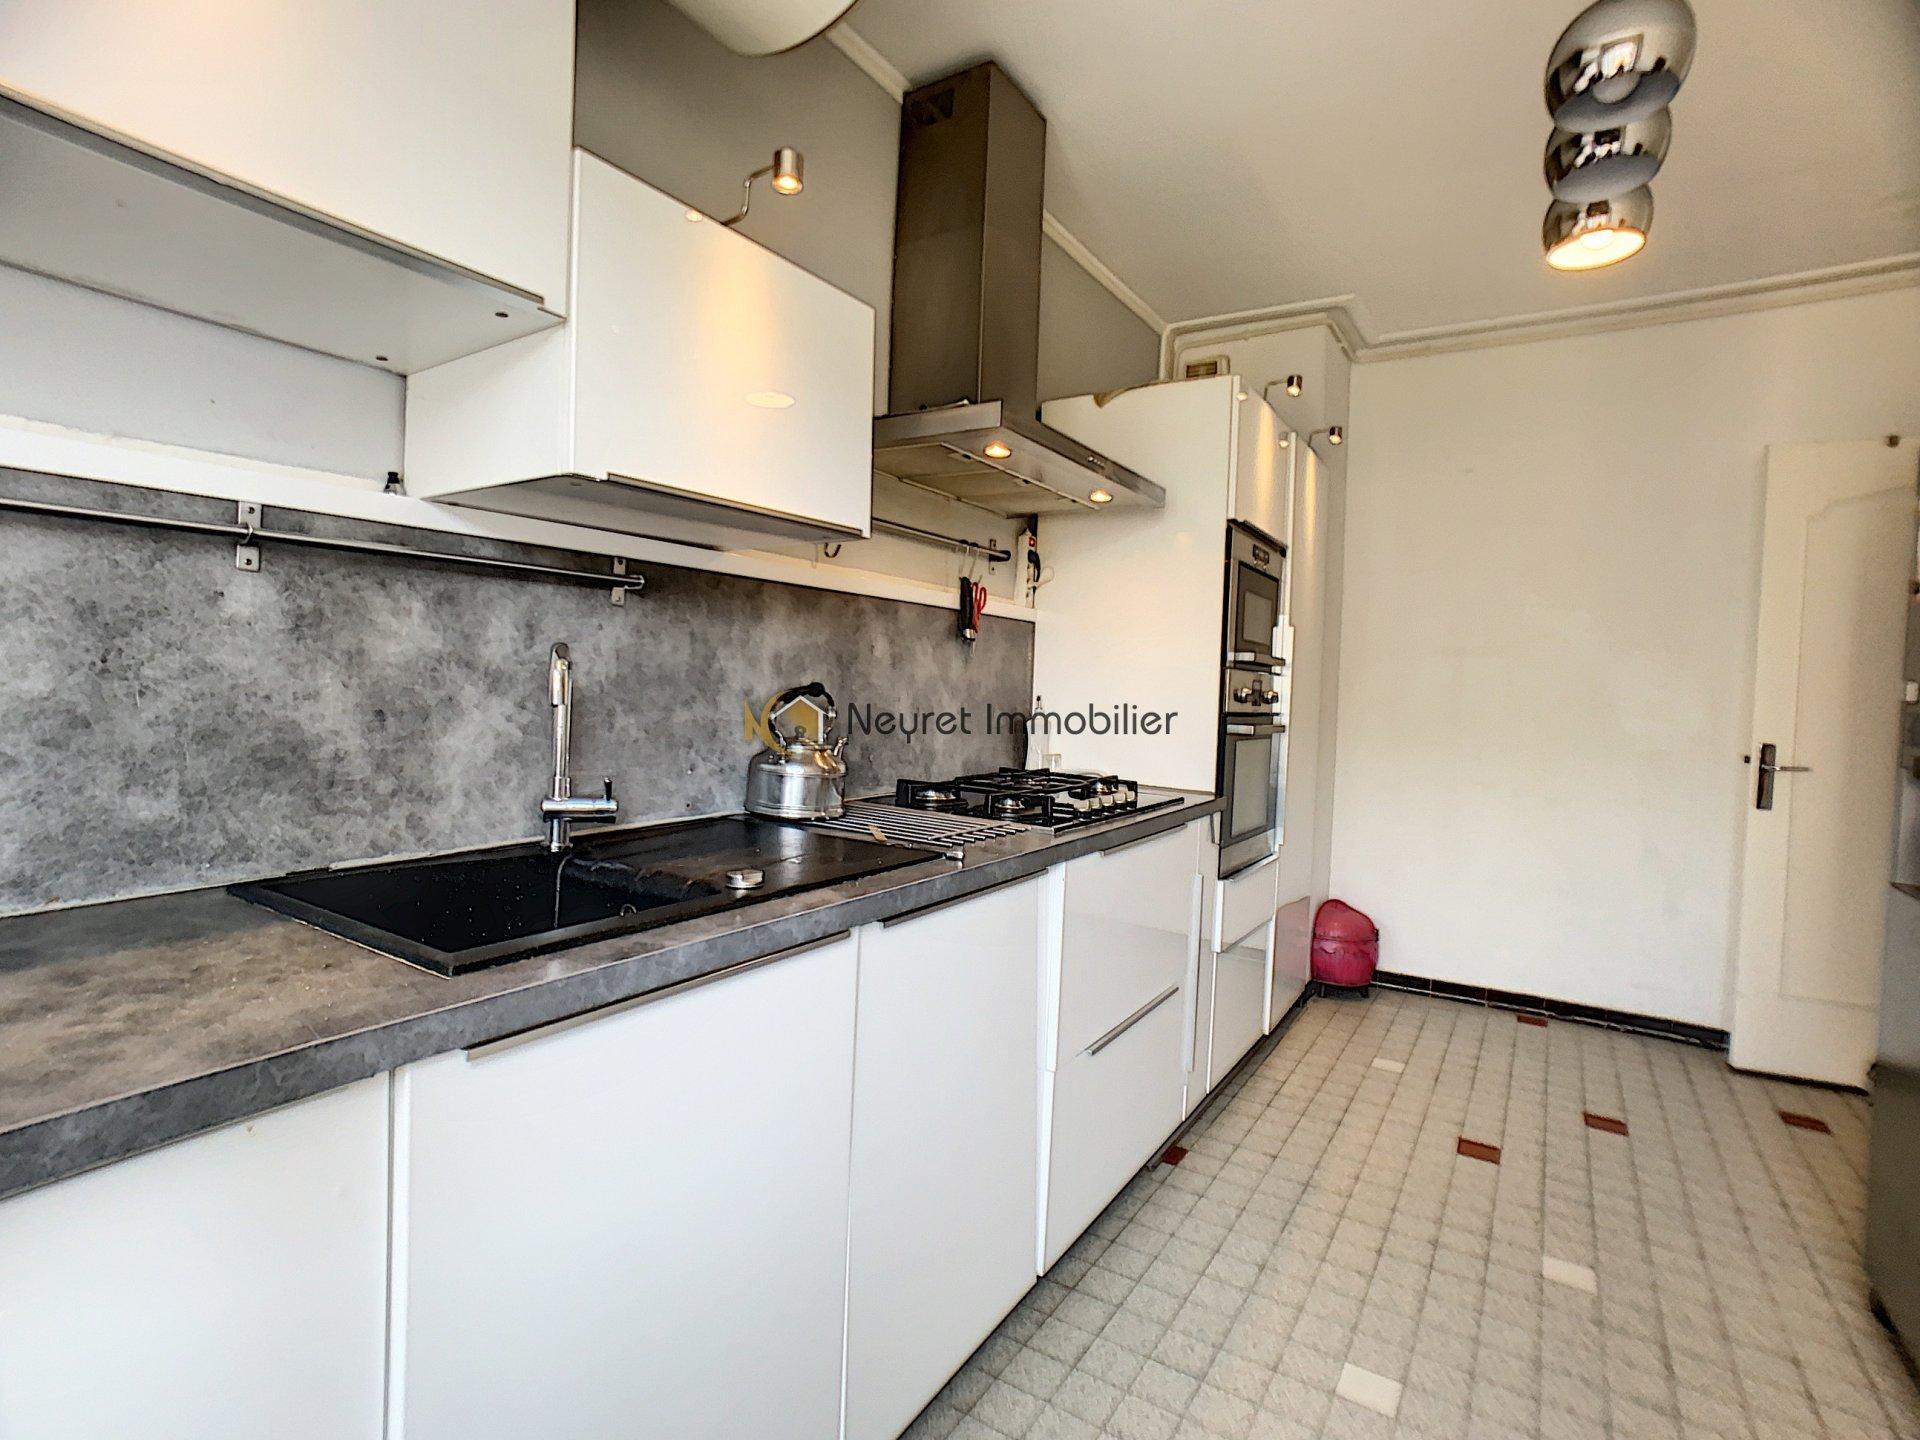 Appartement T4 - Hyper centre